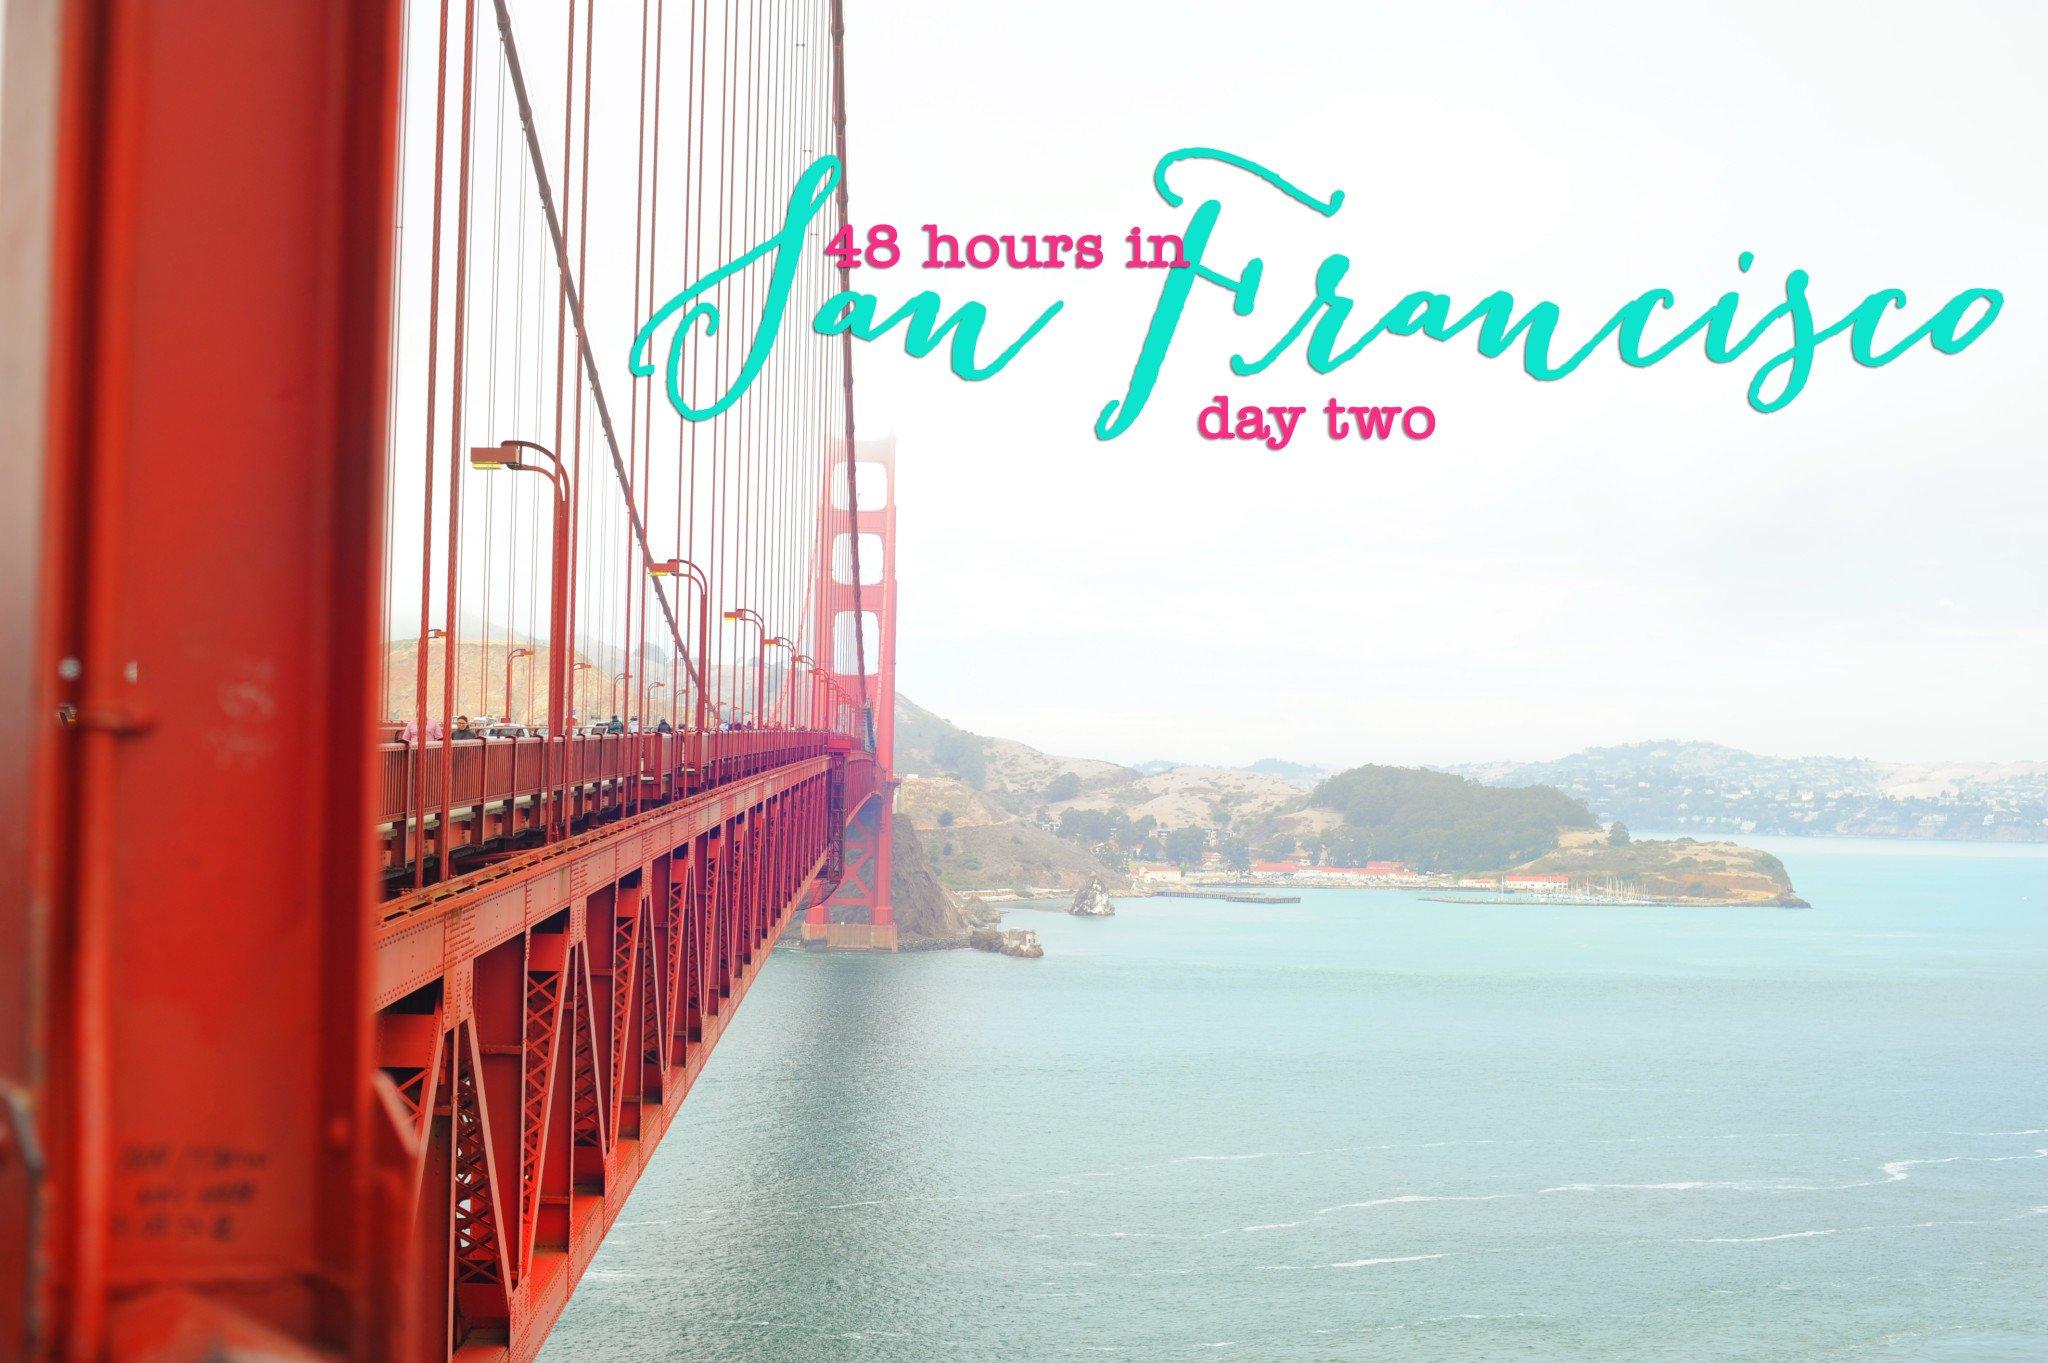 San francisco day two header copy